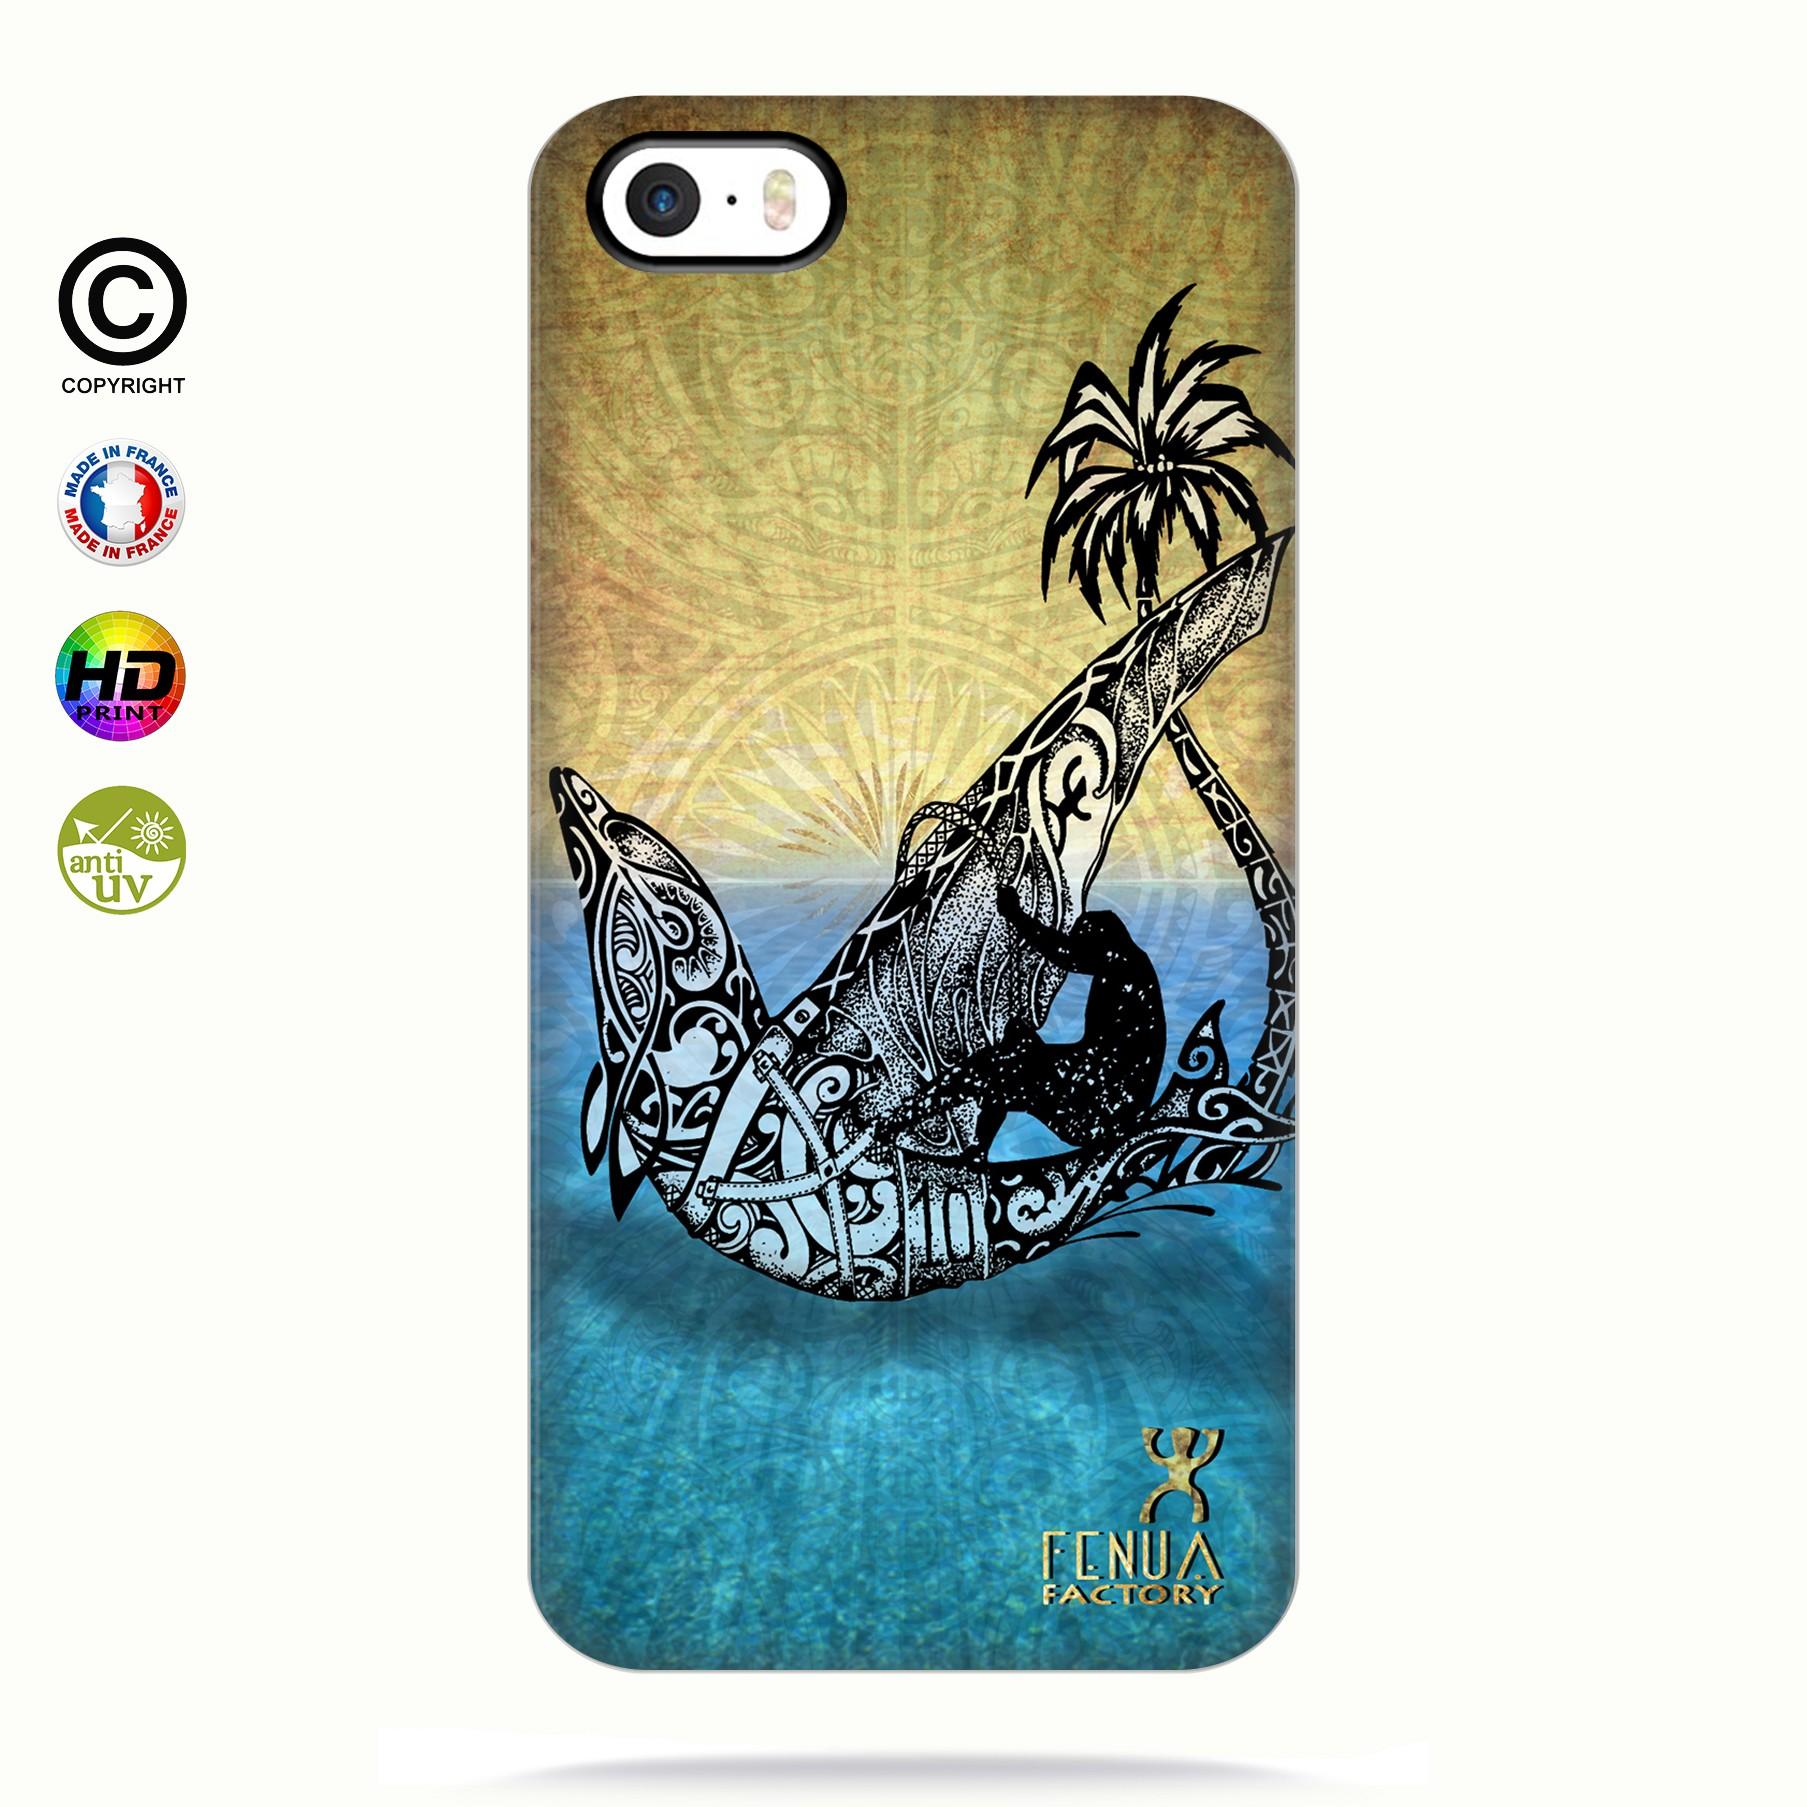 coque iphone 5 requin